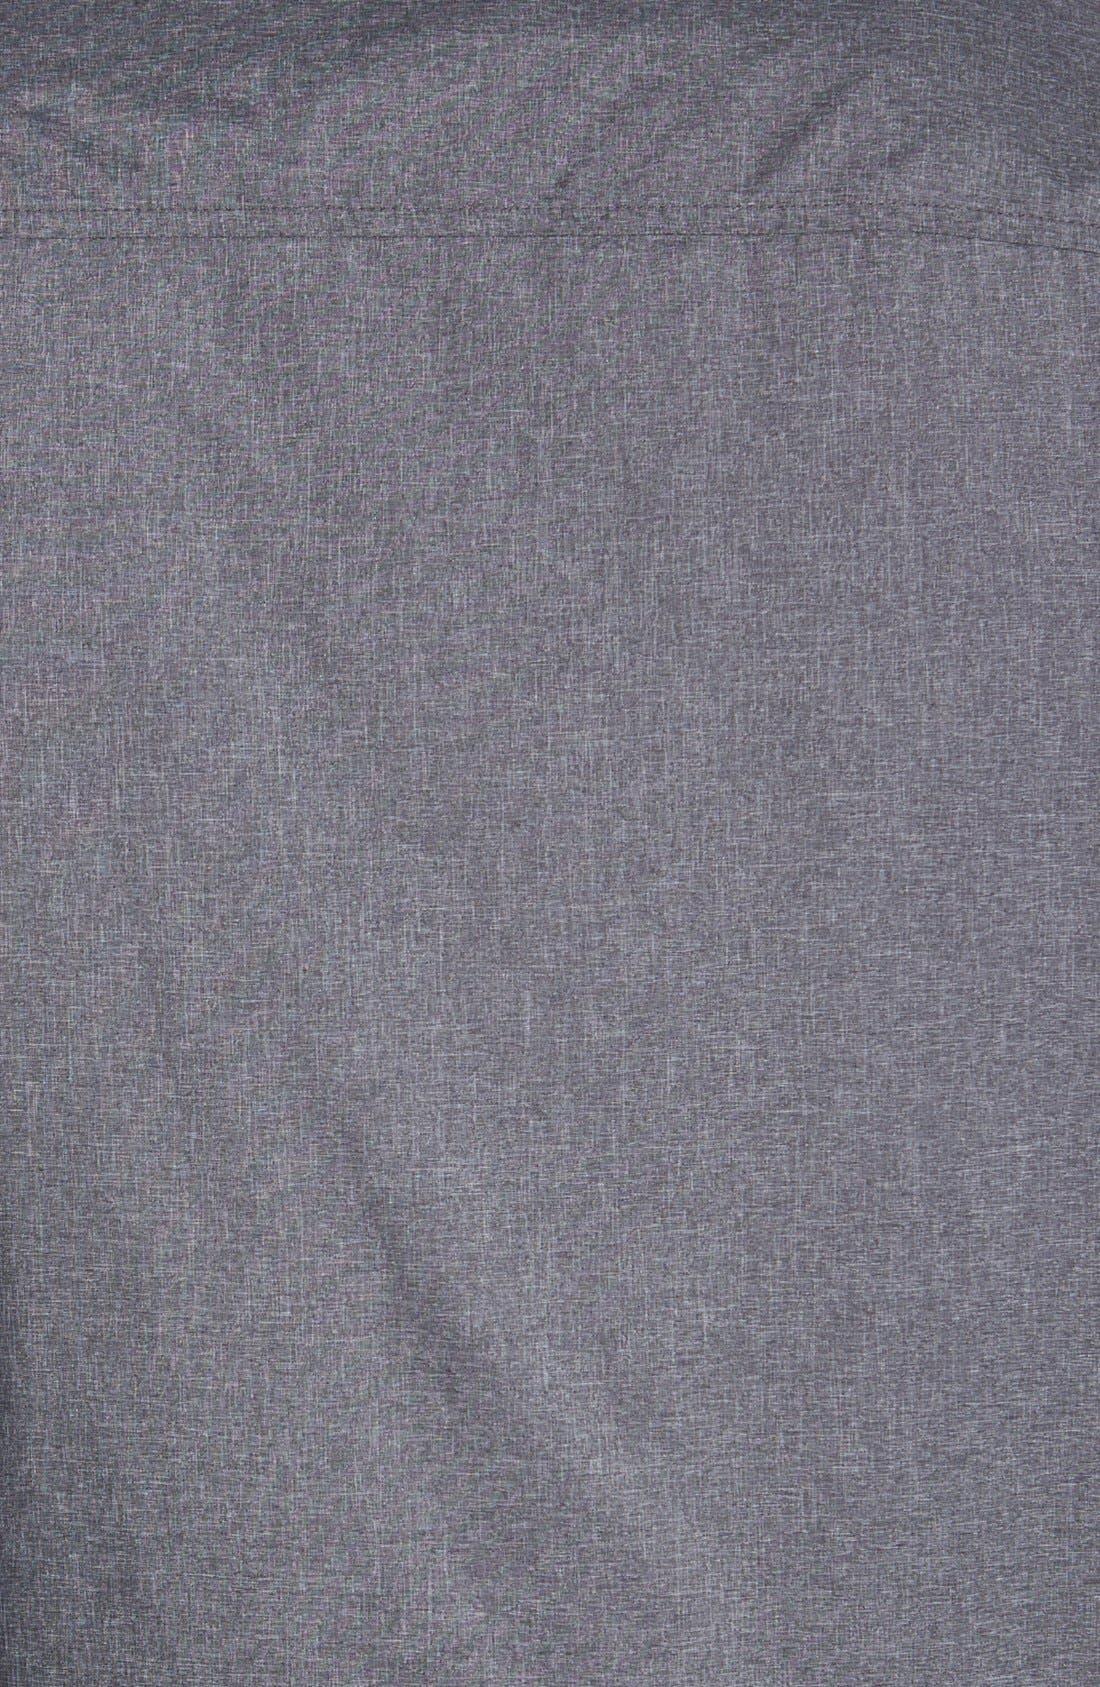 Alternate Image 5  - Michael Kors Trim Fit 3-in-1 Jacket